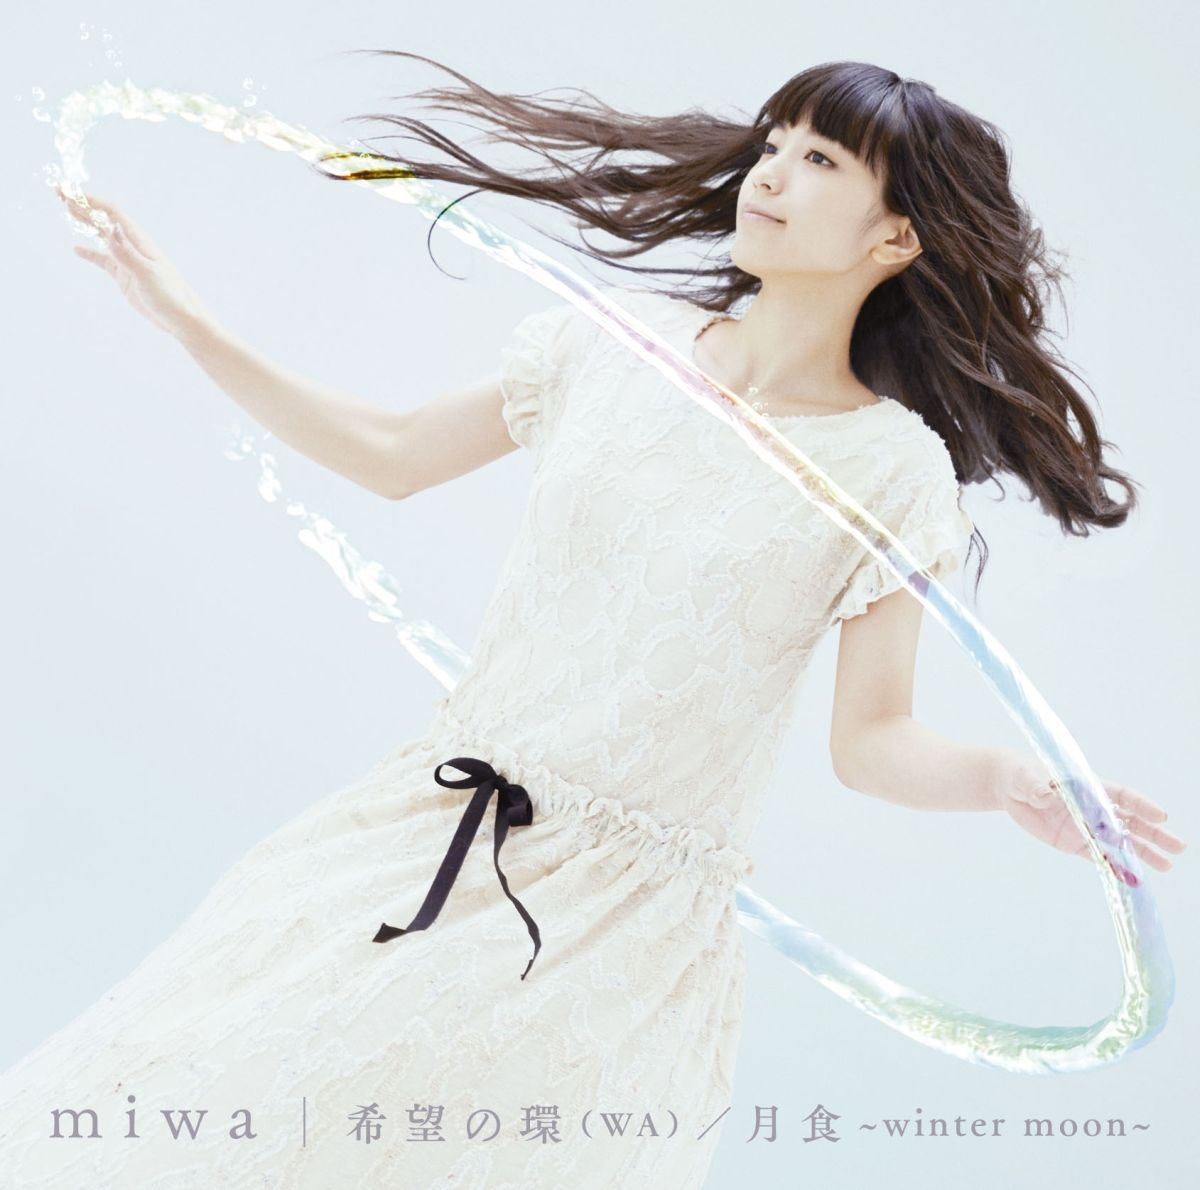 20151206.06.03 miwa - Kibou no Wa (WA) cover 1.jpg